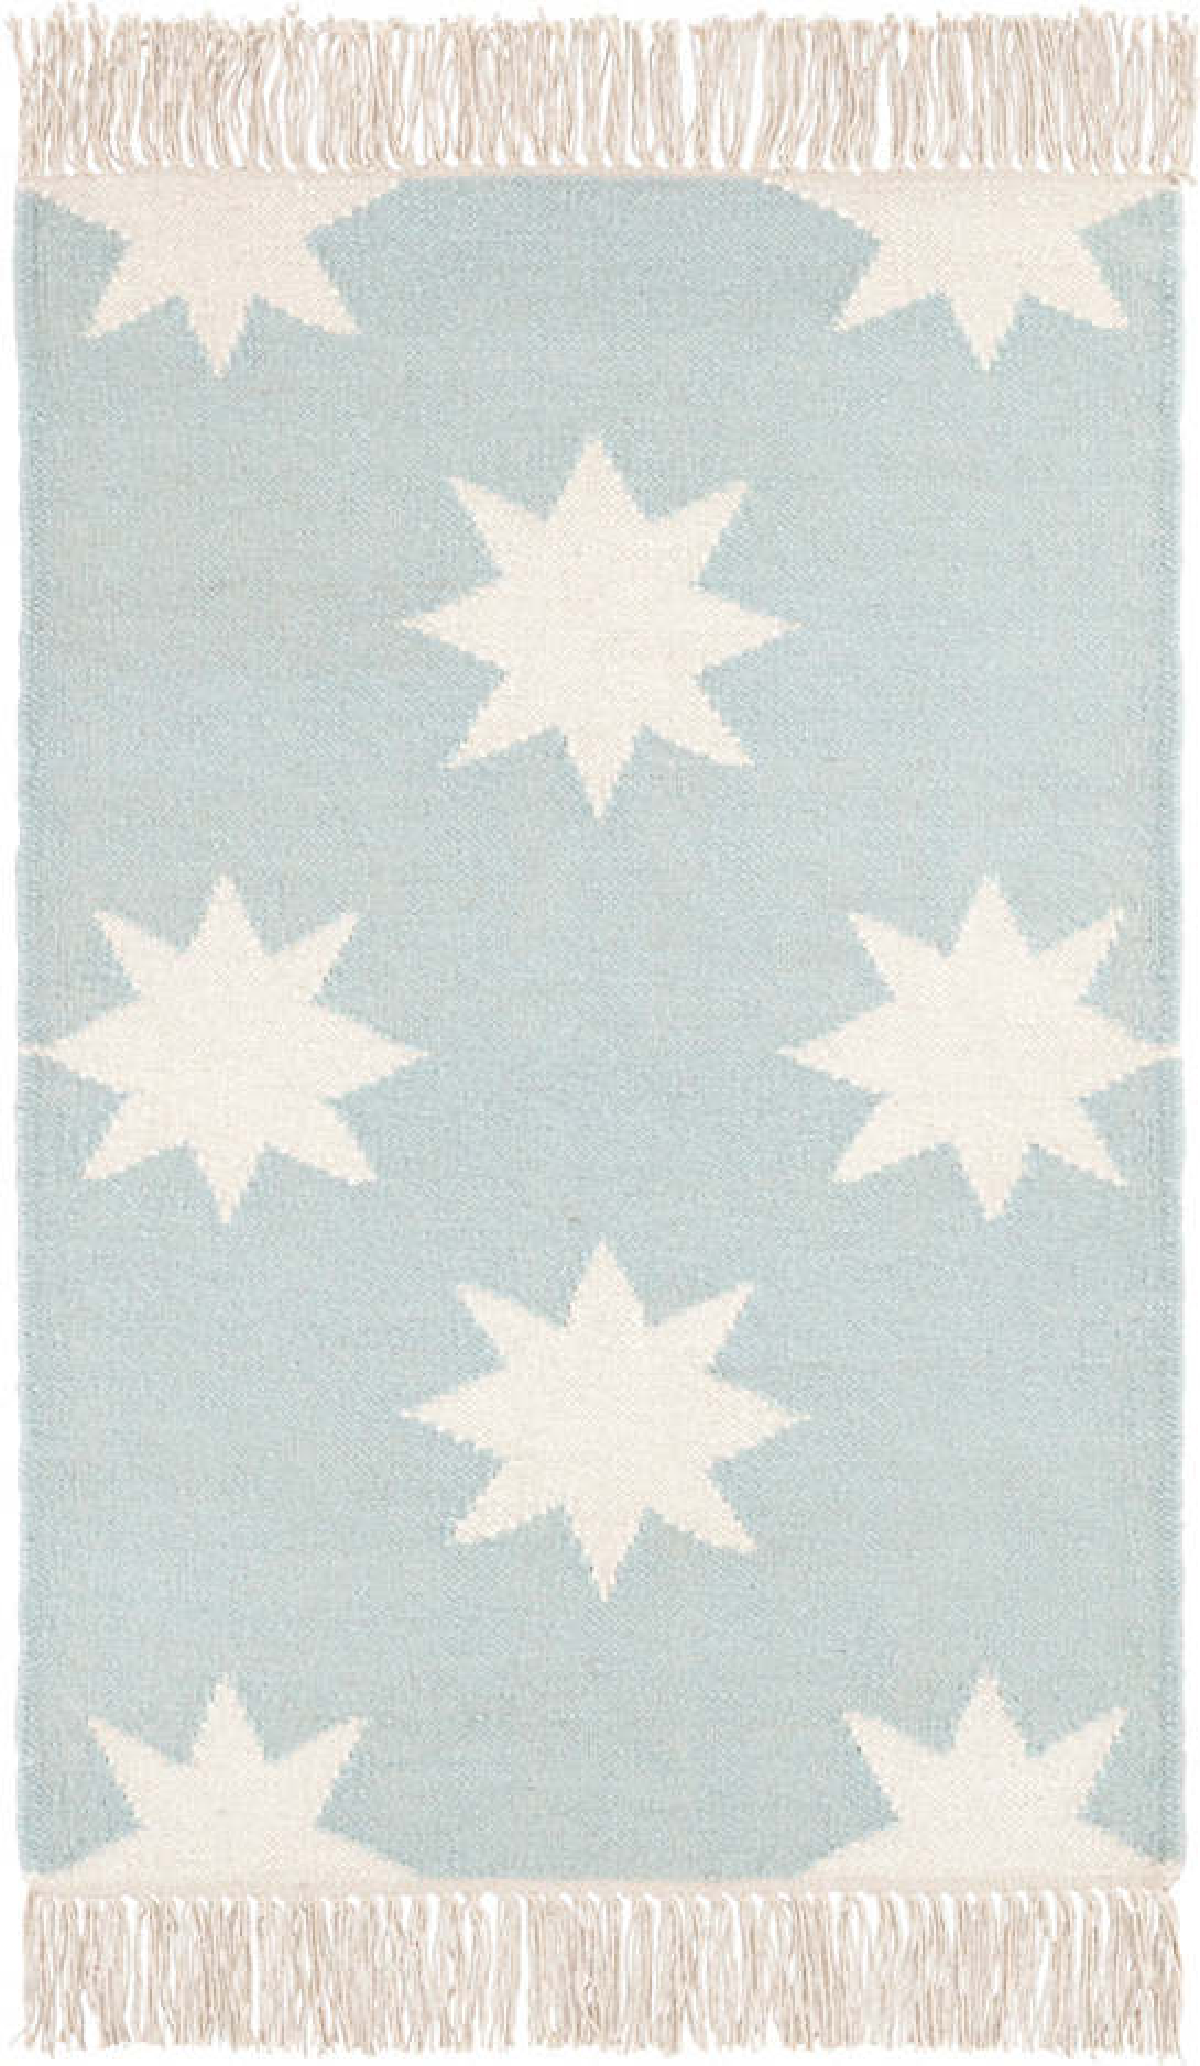 Starlight Woven Wool Rug